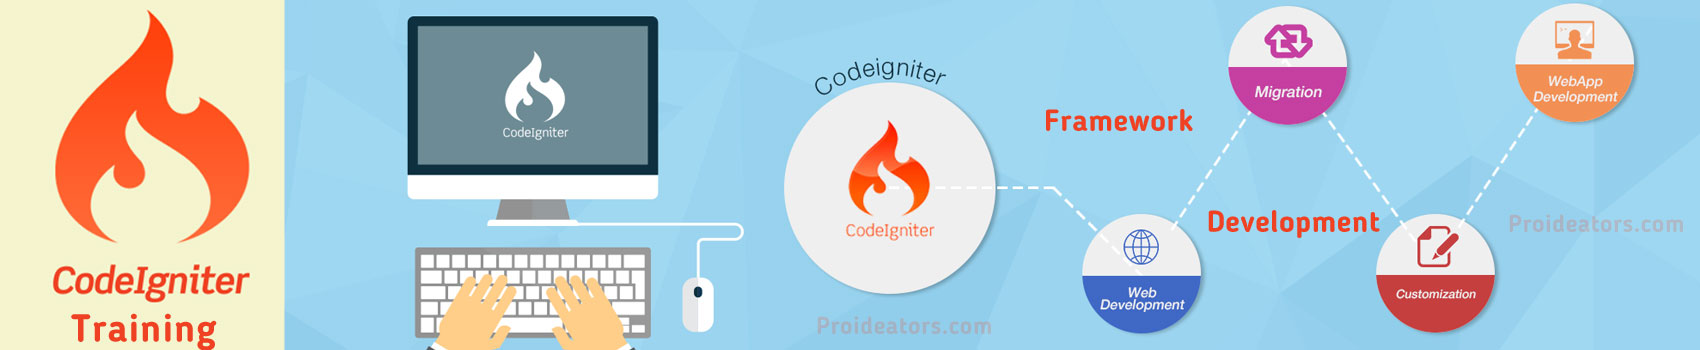 Learn Online CMS Codeigniter PHP frameworks Developer database Programming Training Course Tutorial Certification